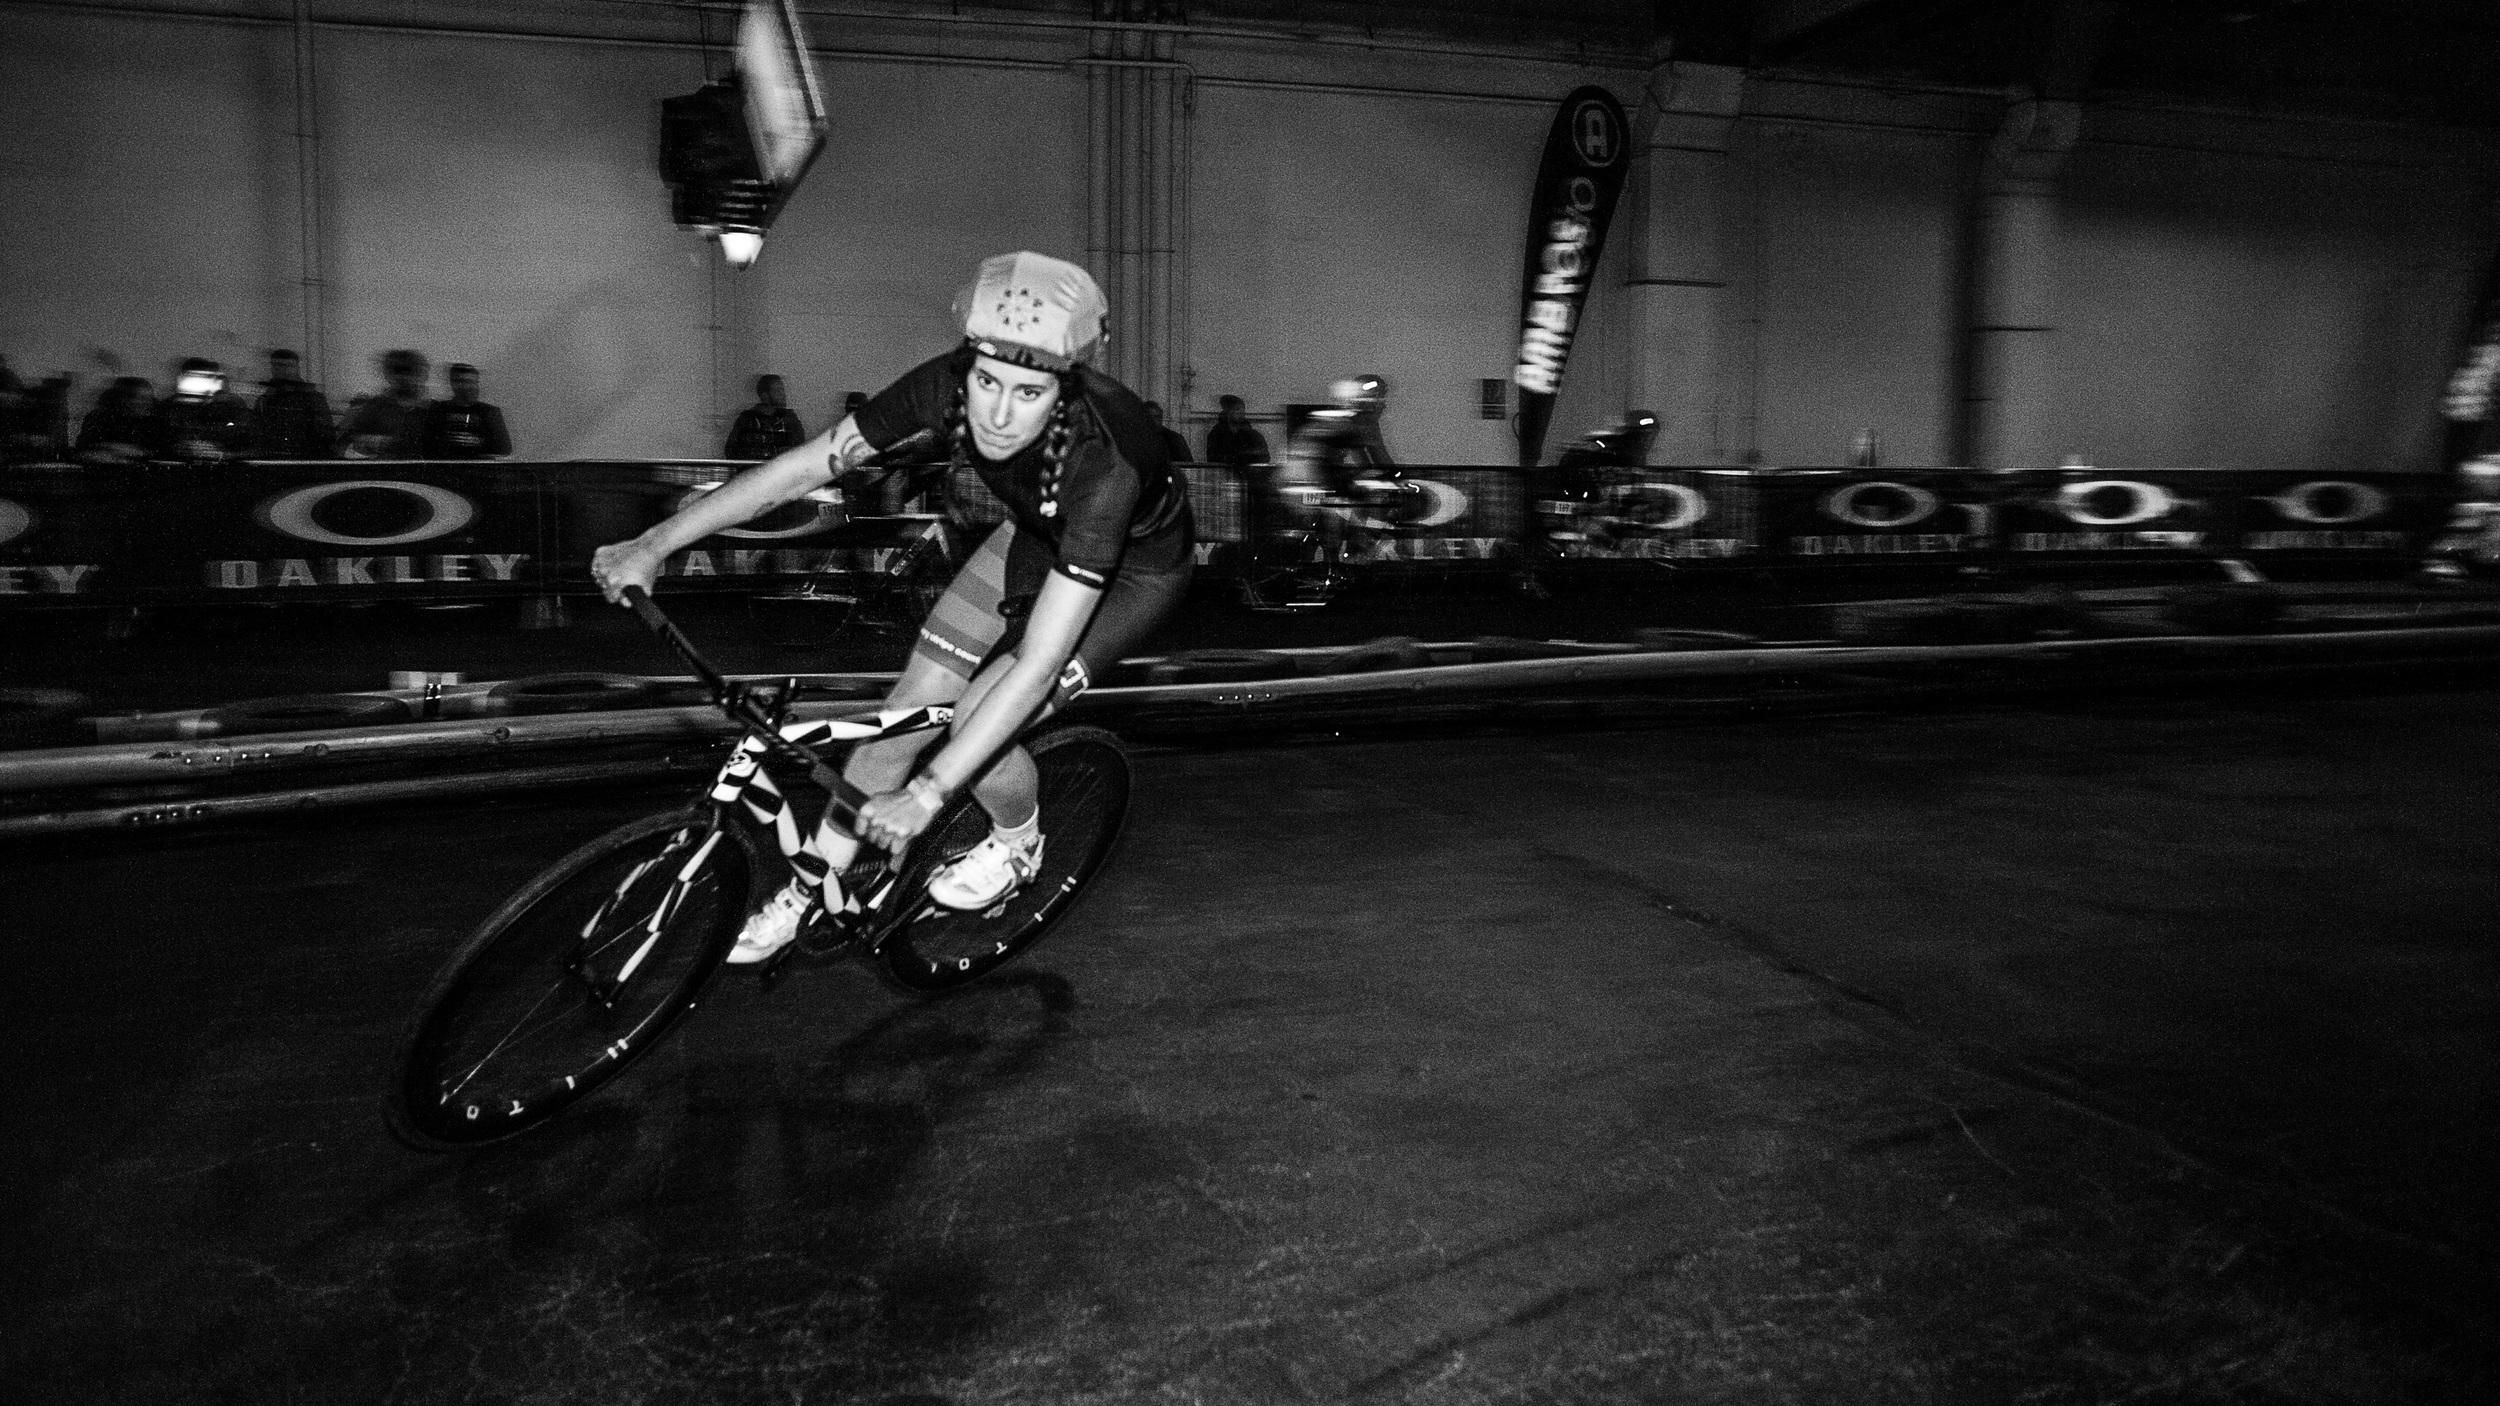 RAD RACE Last Man Standing, Berlin March 19 2016 - Shot by Drew Kaplan 37.jpg